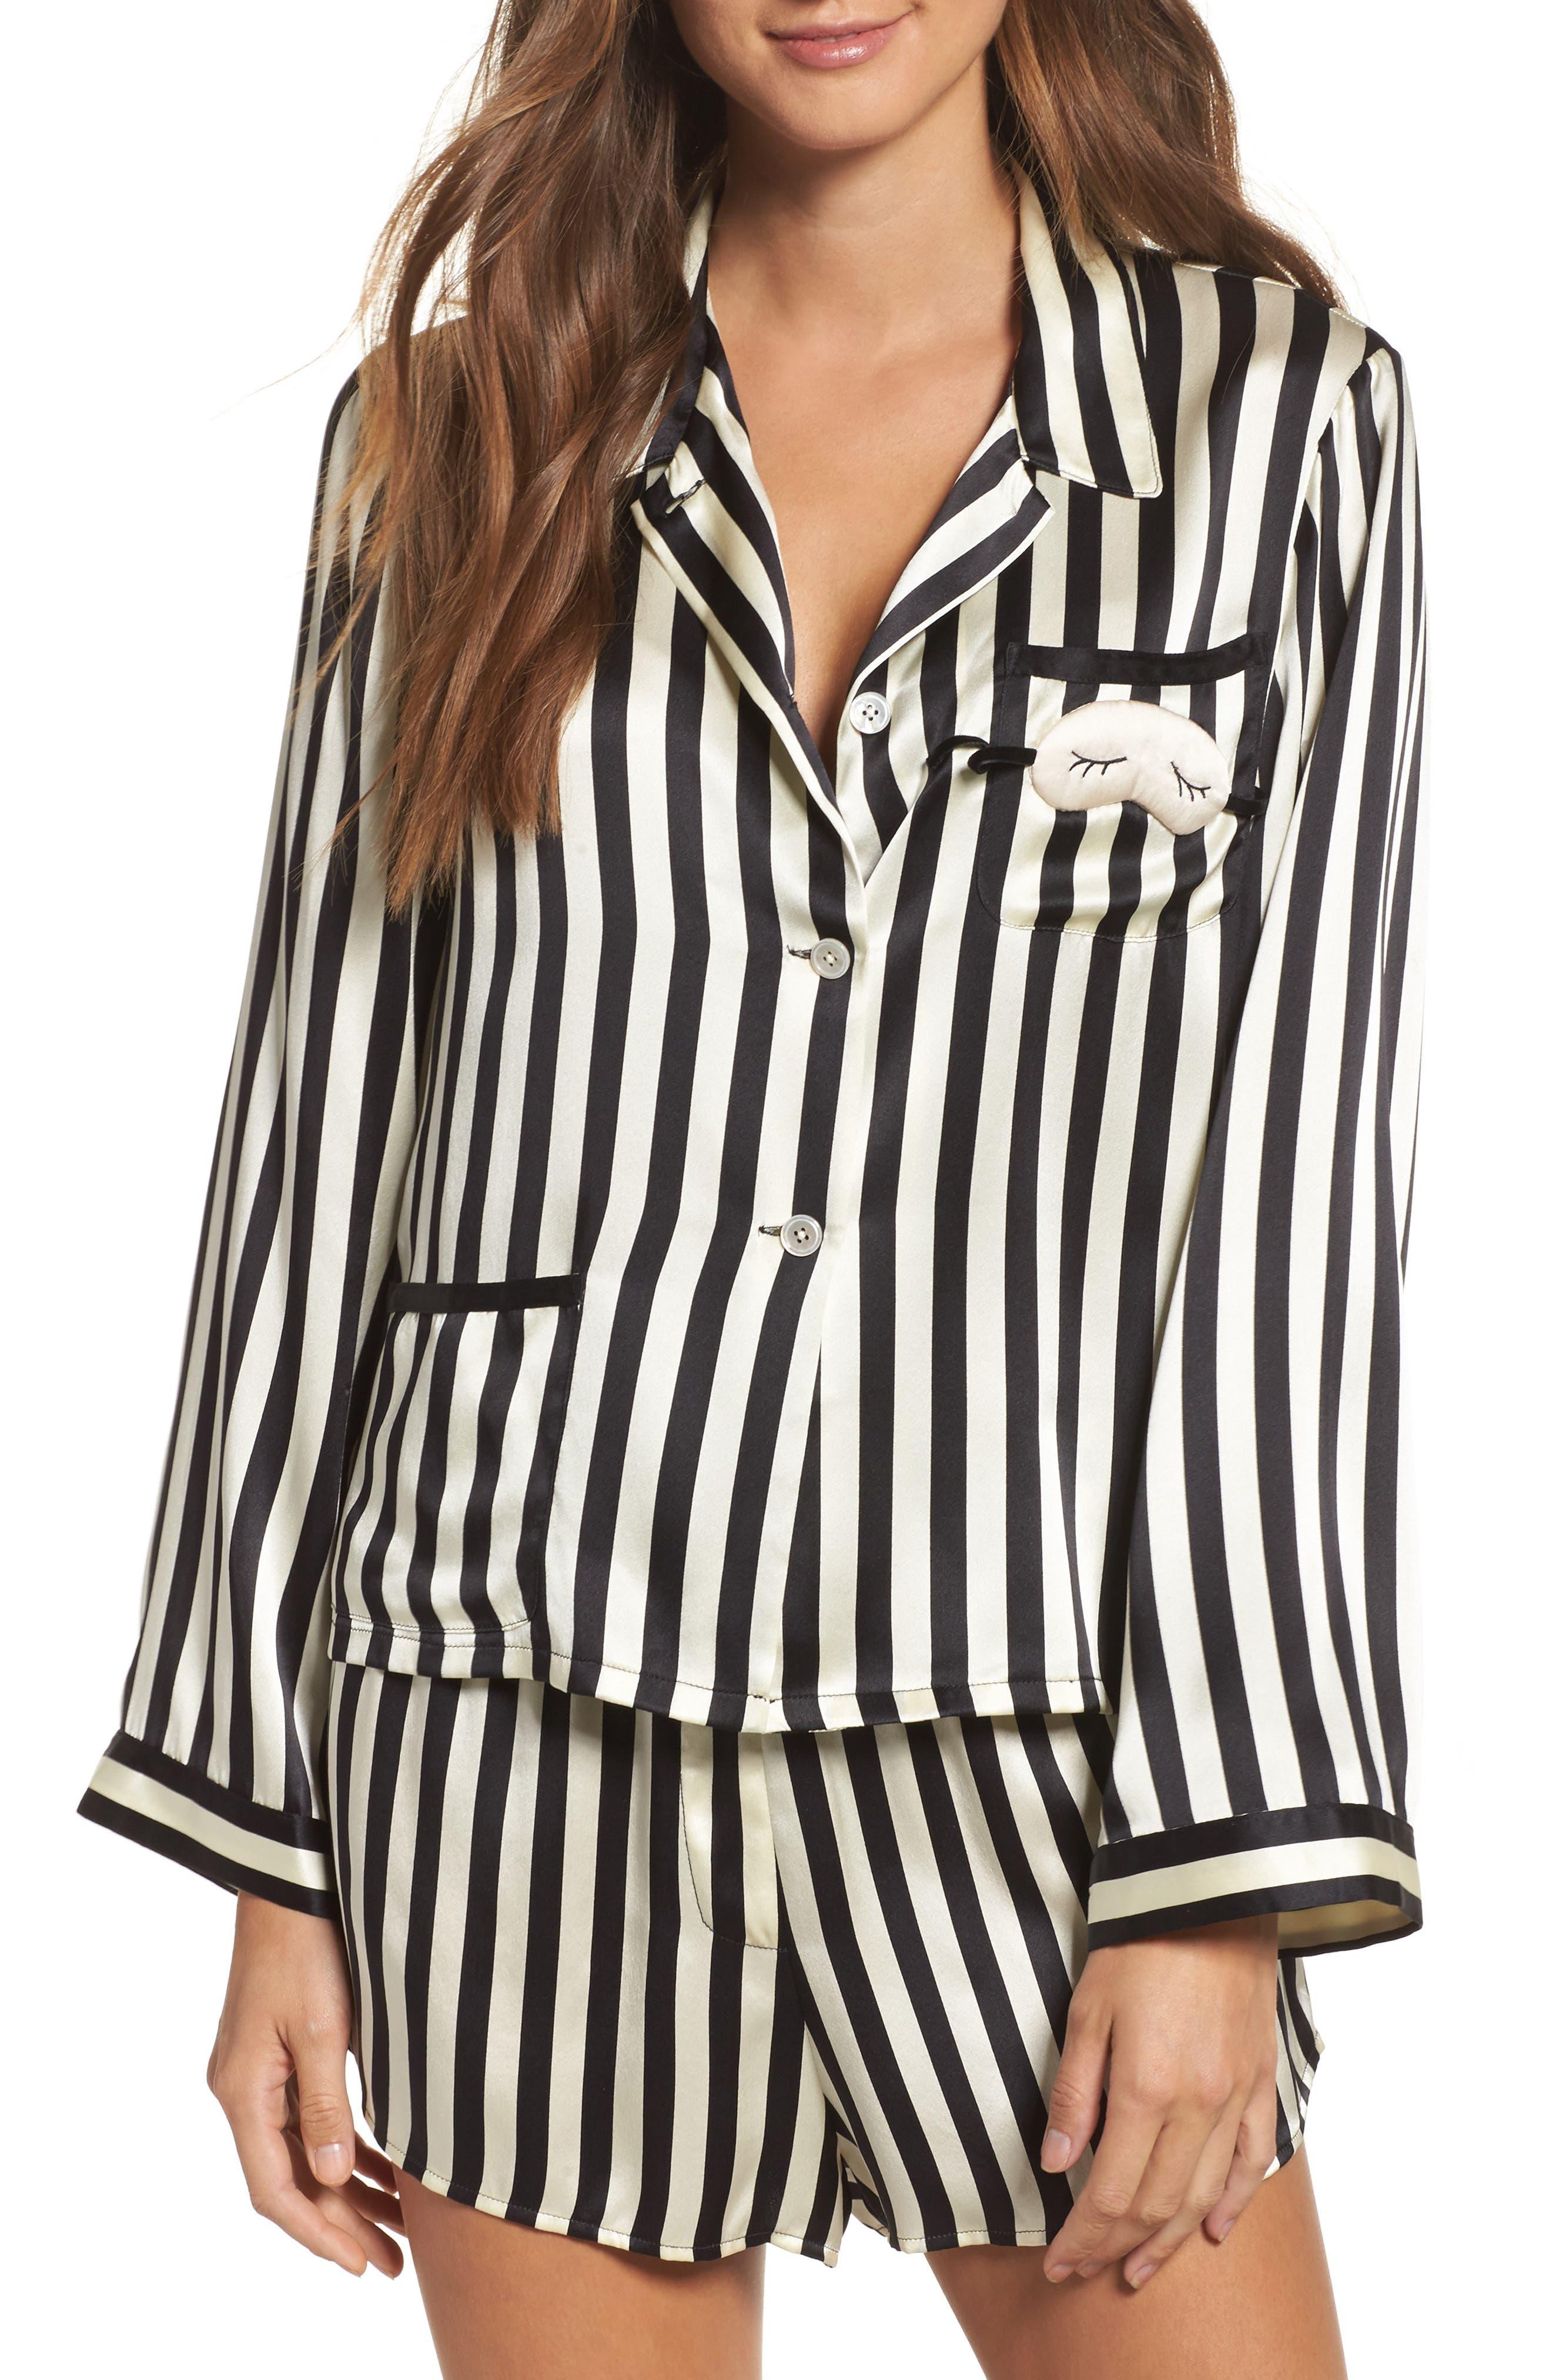 x Amanda Fatherazi Ruthie Mini Mask Stripe Pajama Top,                         Main,                         color, Noir/ Ecru